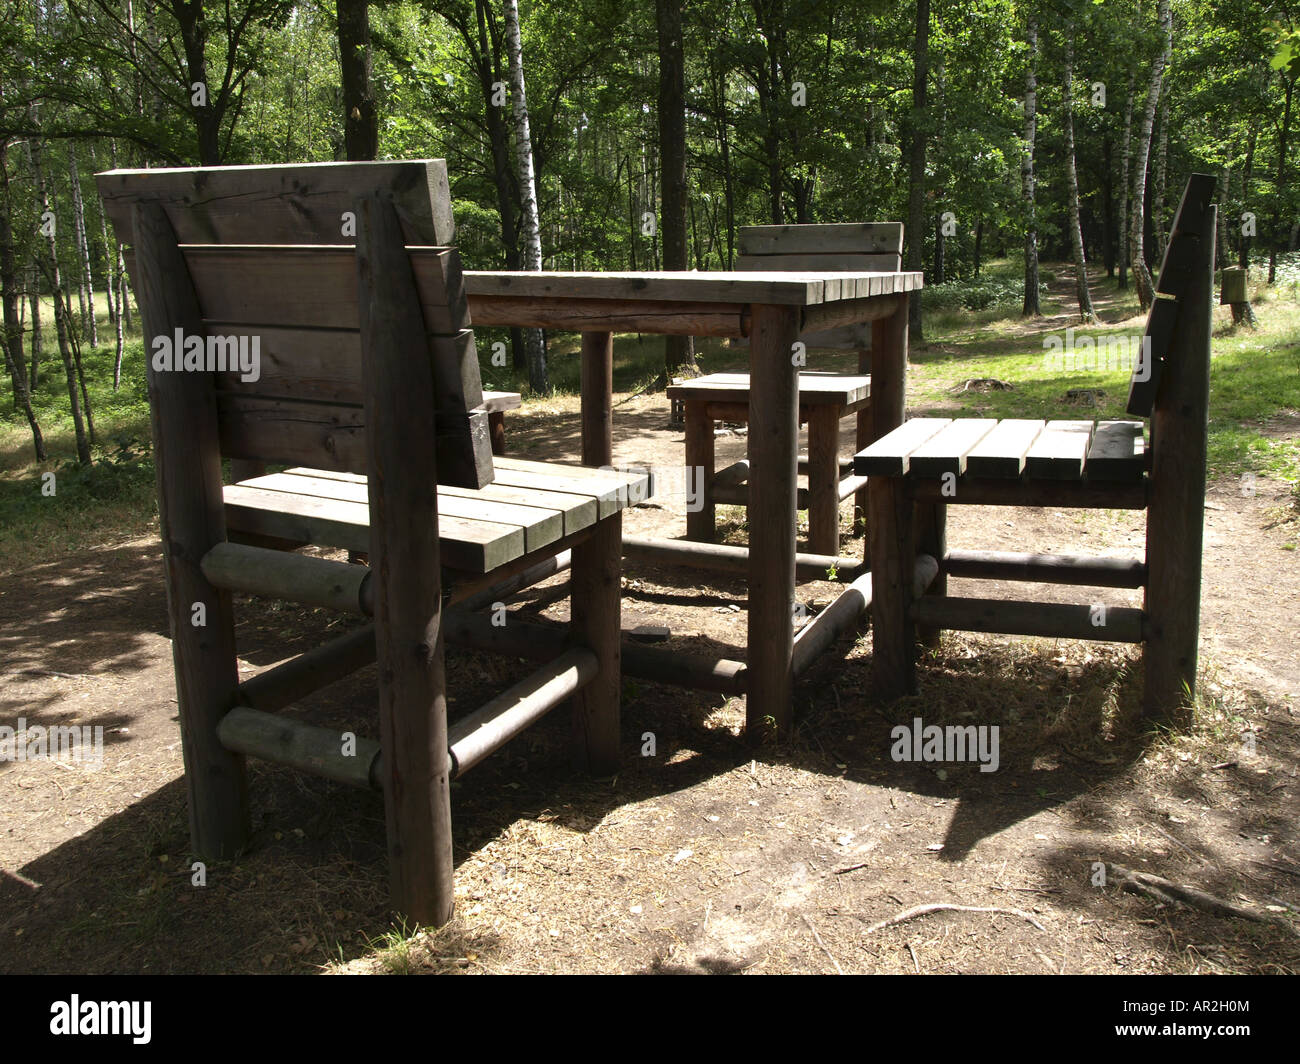 Elegant Natural Park Blockheide, Oversized Wooden Chairs And Table, Austria, Lower  Austria, Waldviertel